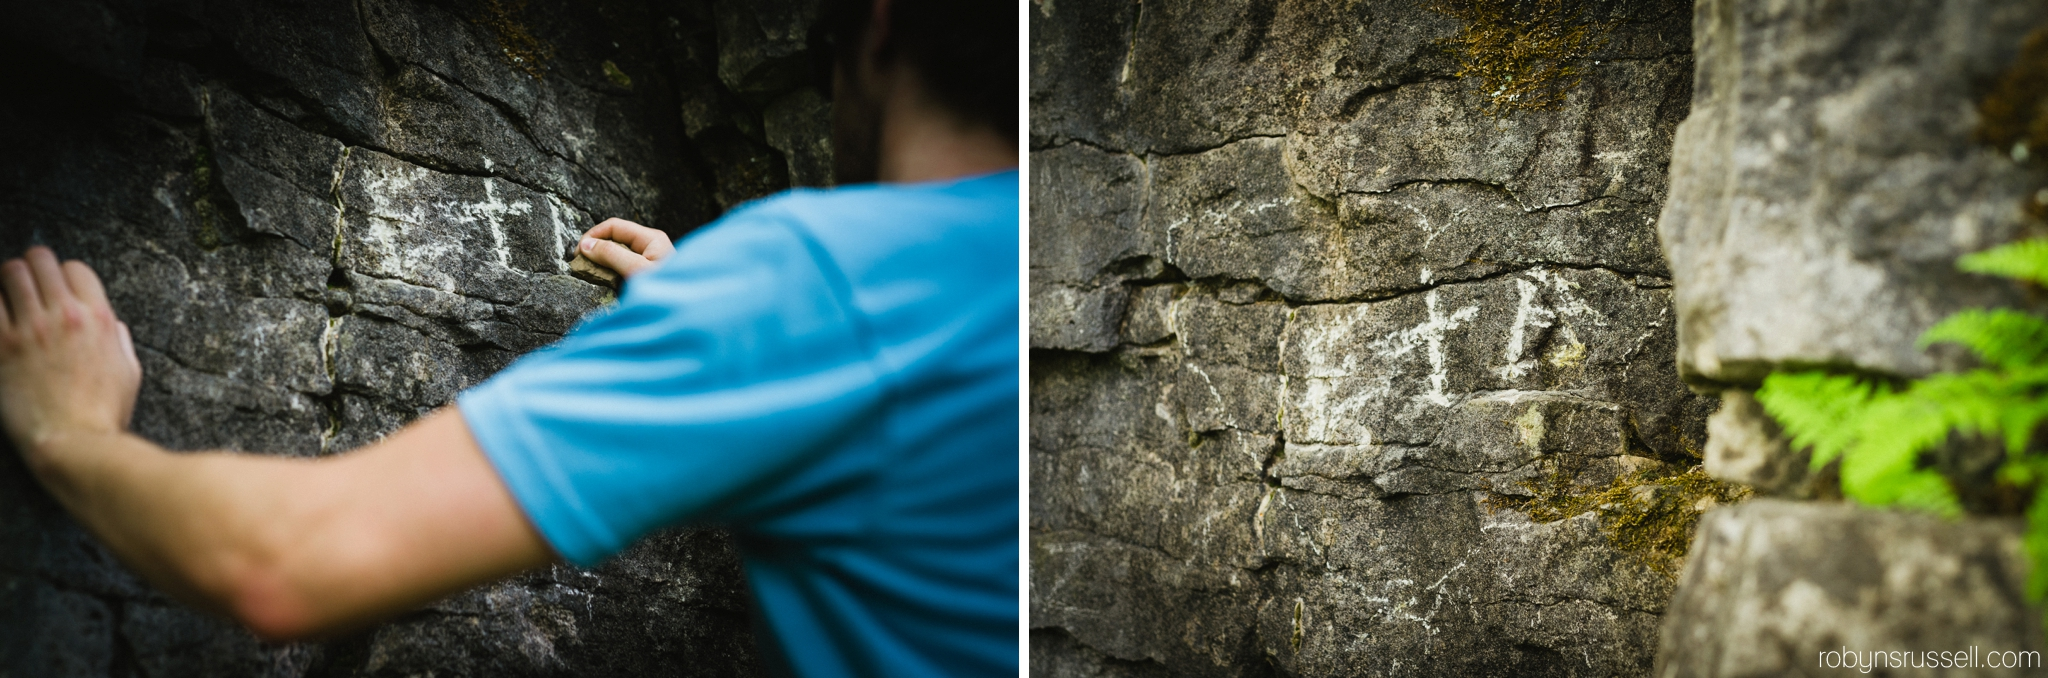 10-carving-names-in-rocks-engagement.jpg